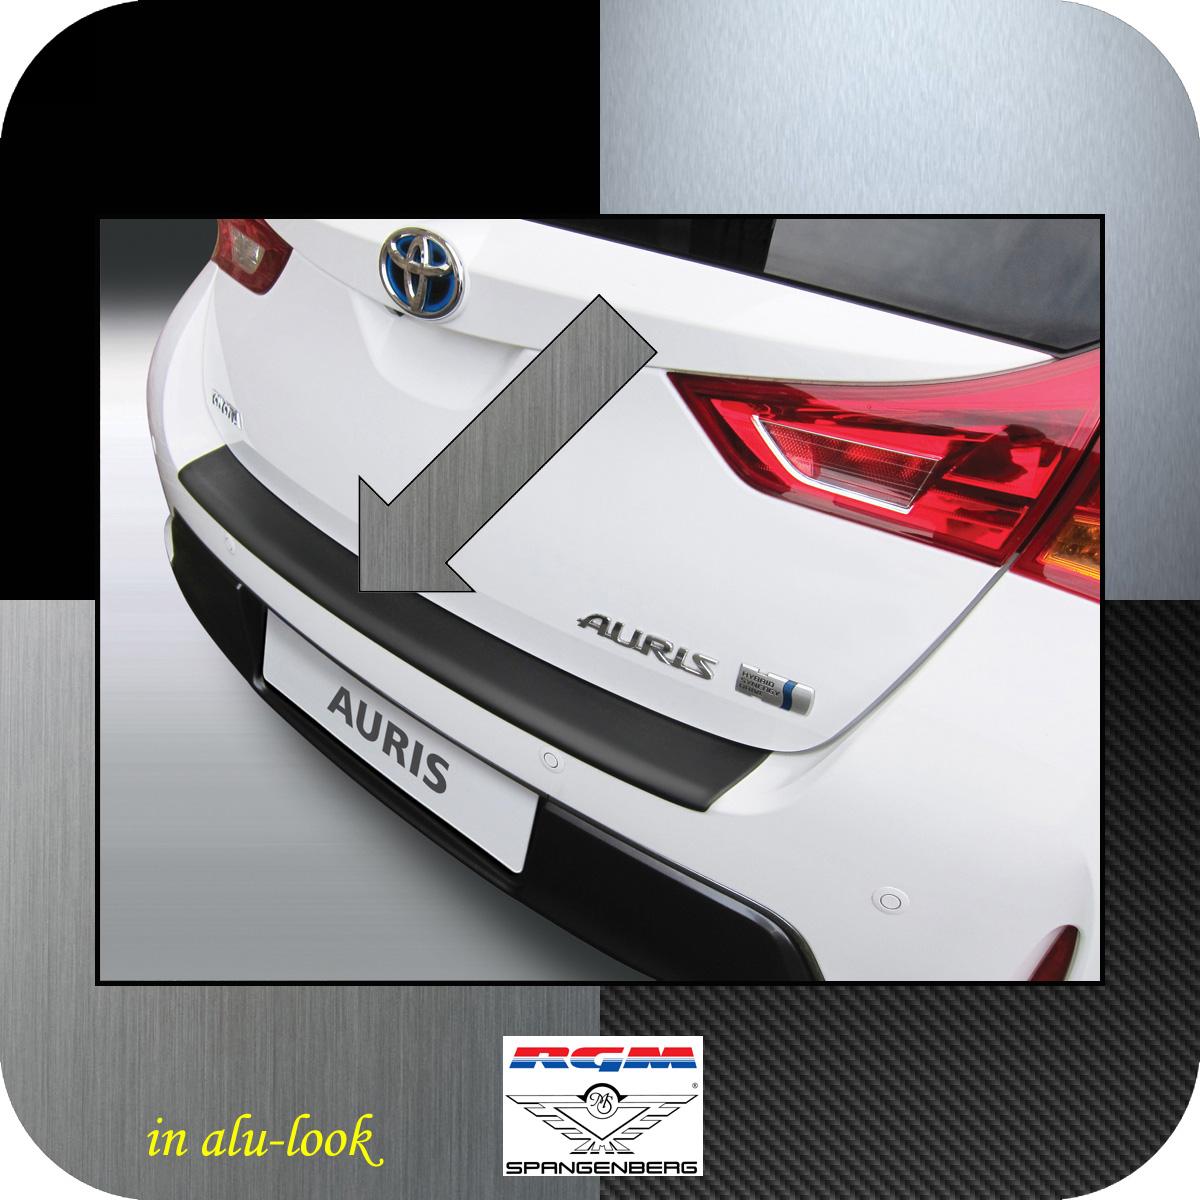 Ladekantenschutz Alu-Look Toyota Auris II Schrägheck vor Mopf 2012-15 3504620